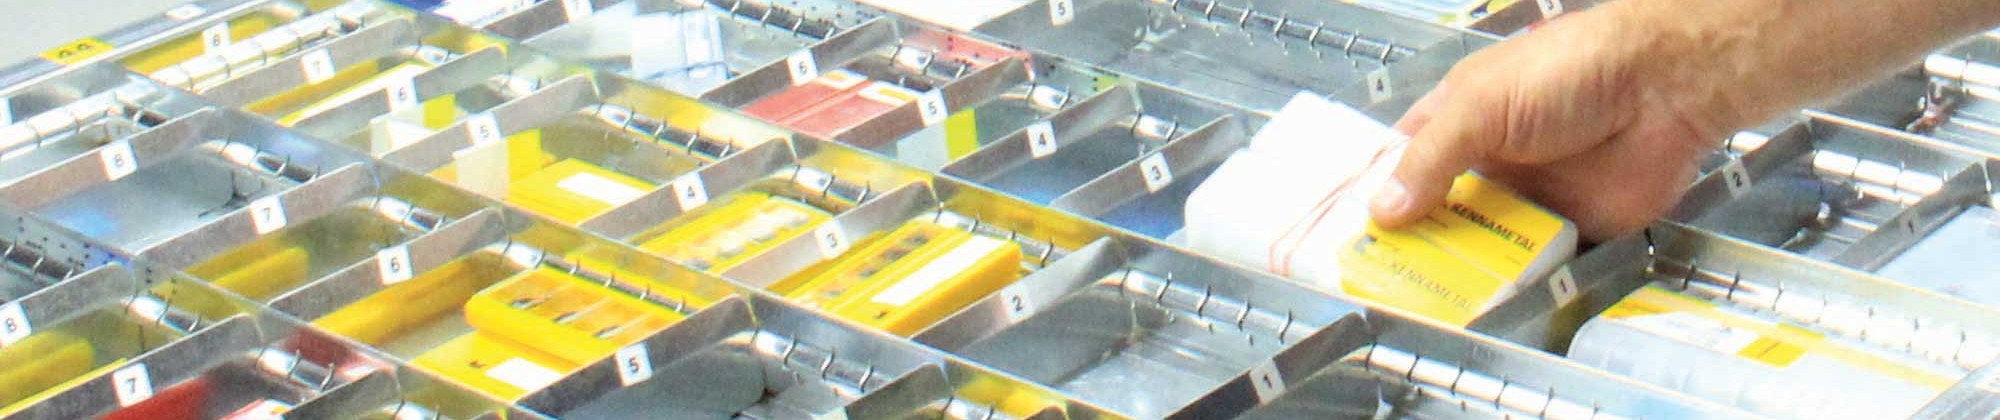 The finer reels of life peliautomaatti